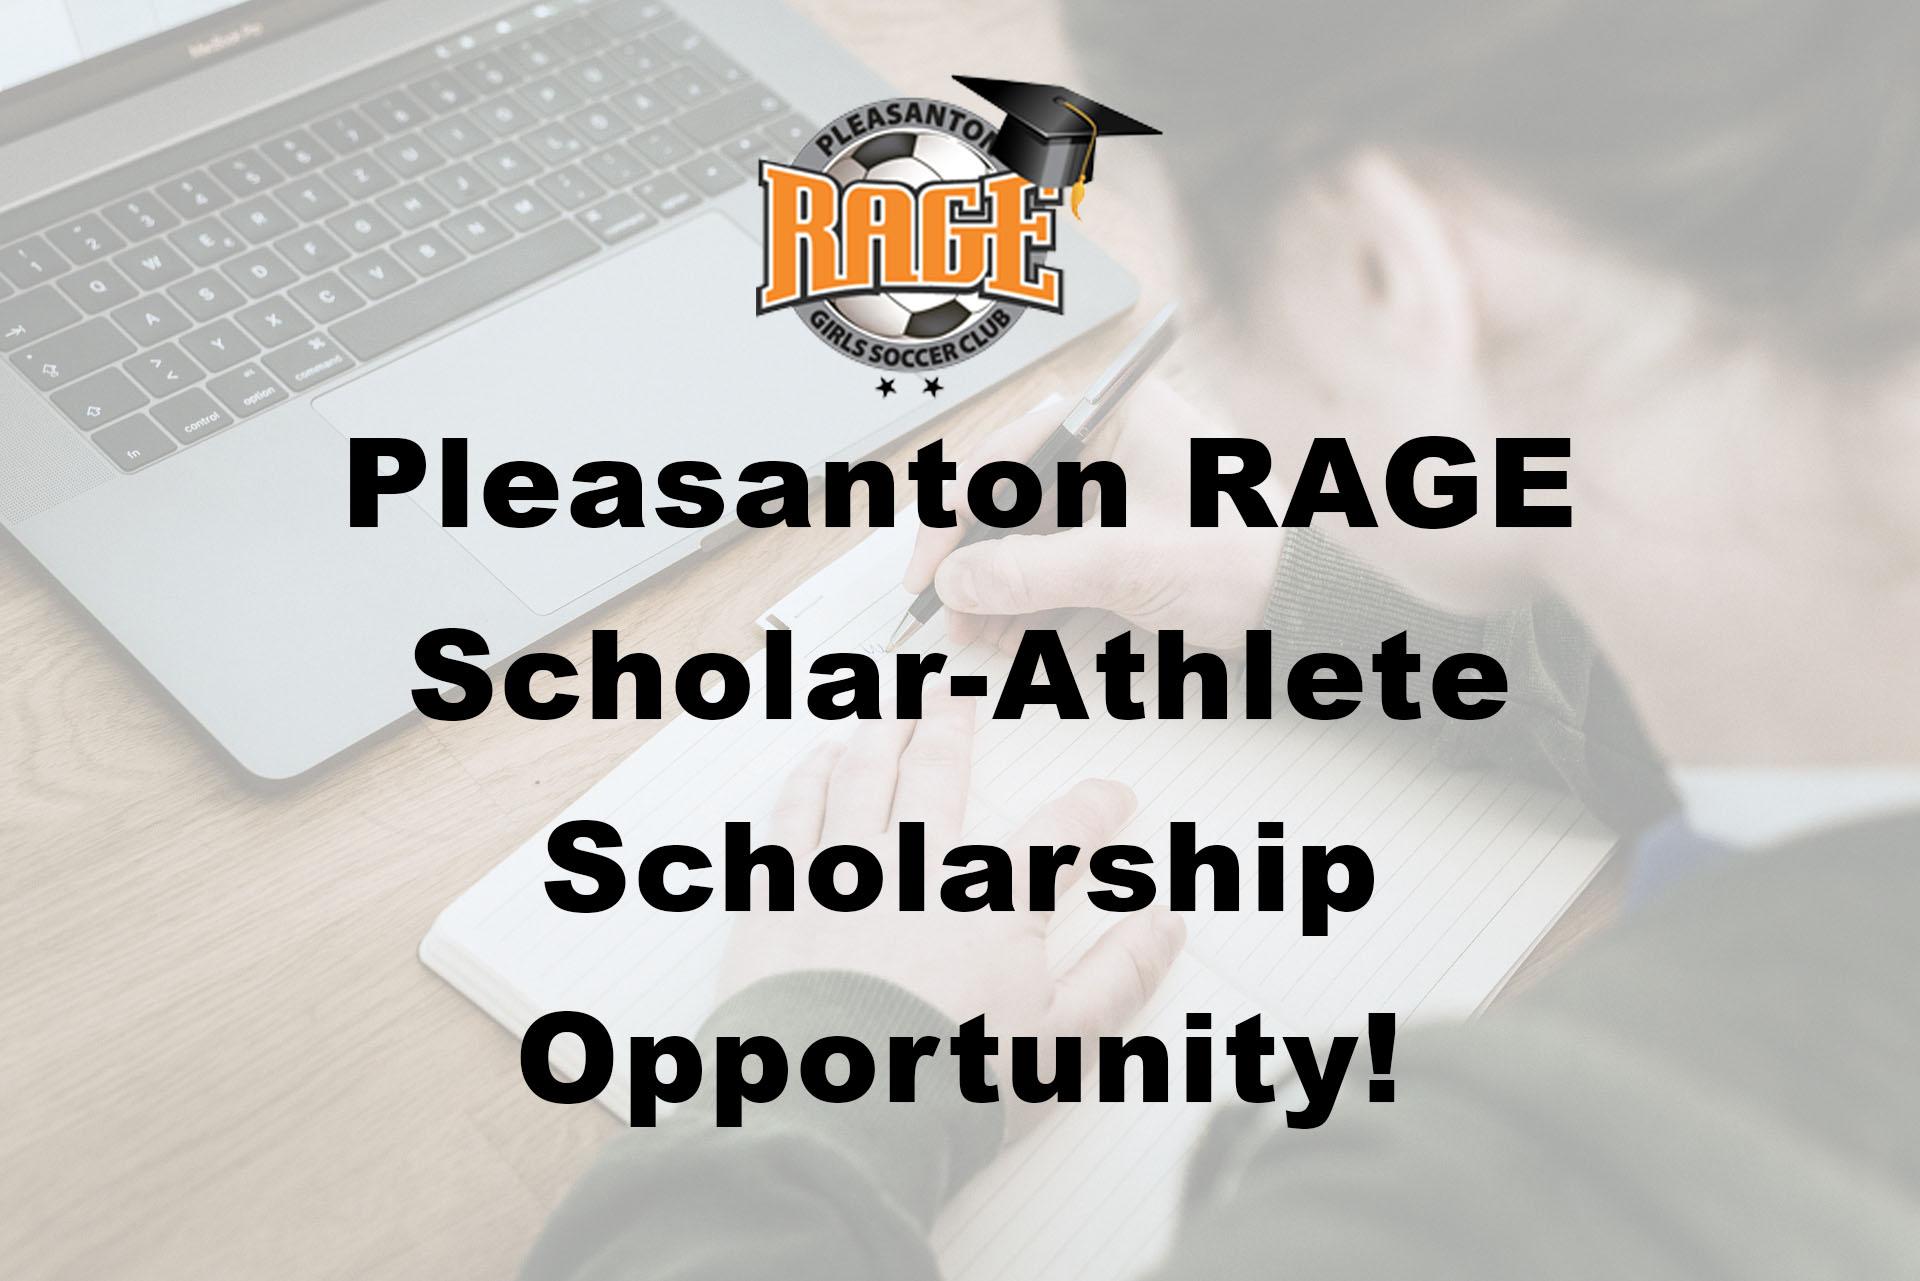 Rage scholarship